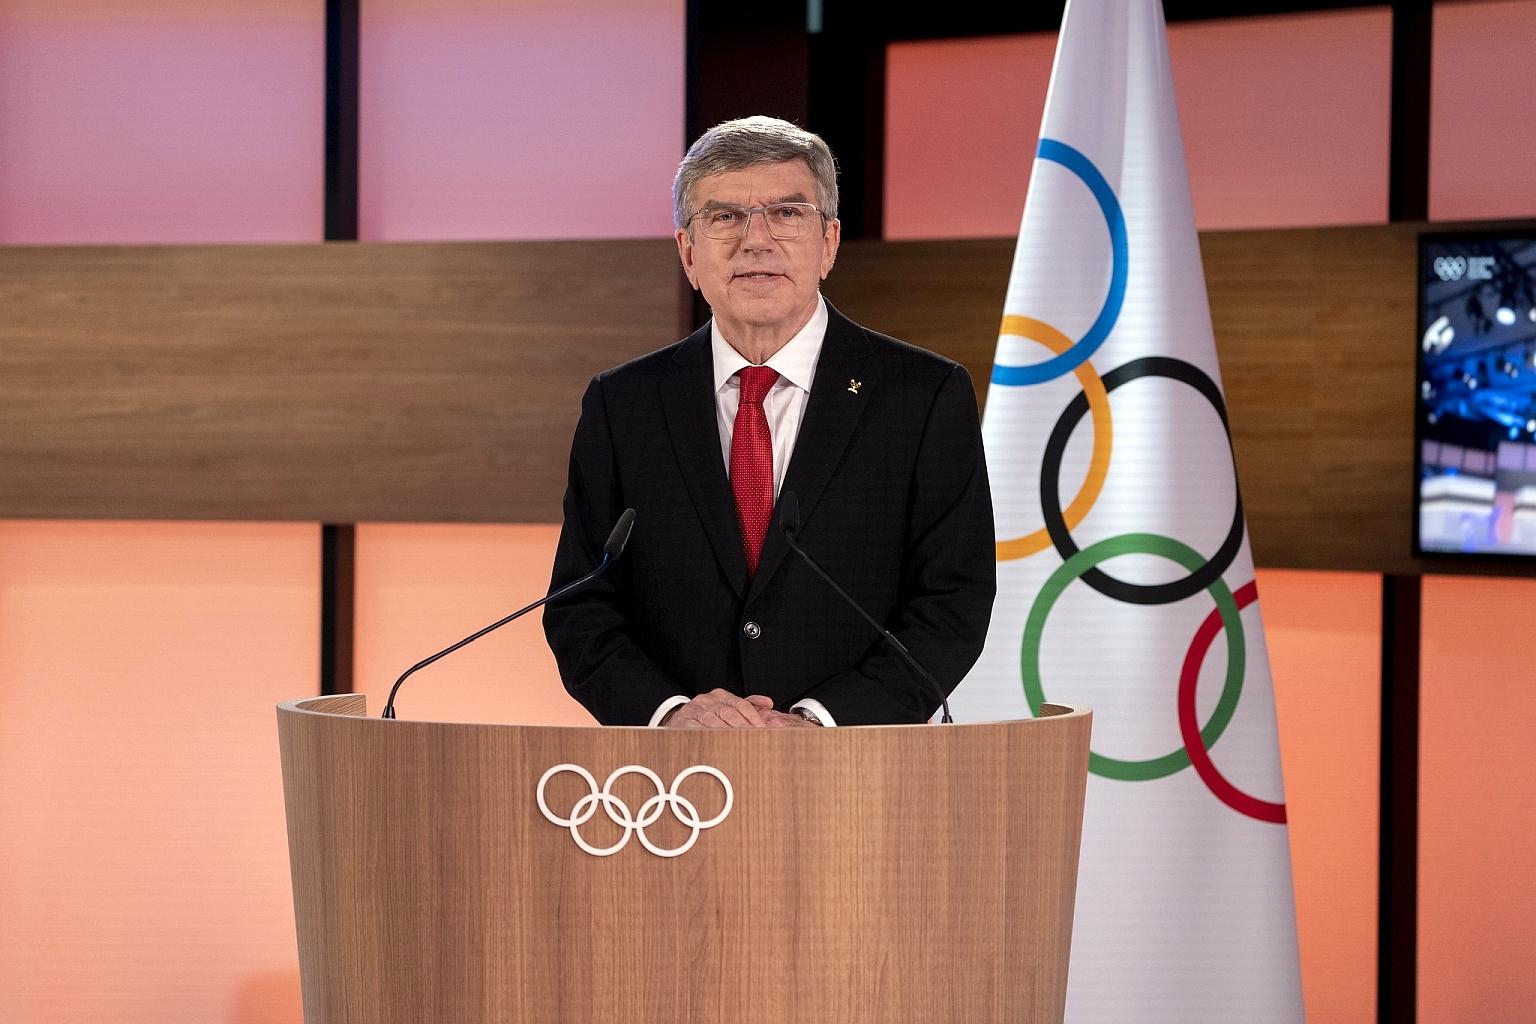 Foto: Thomas Bach als IOC Präsident wiedergewählt - © IOC